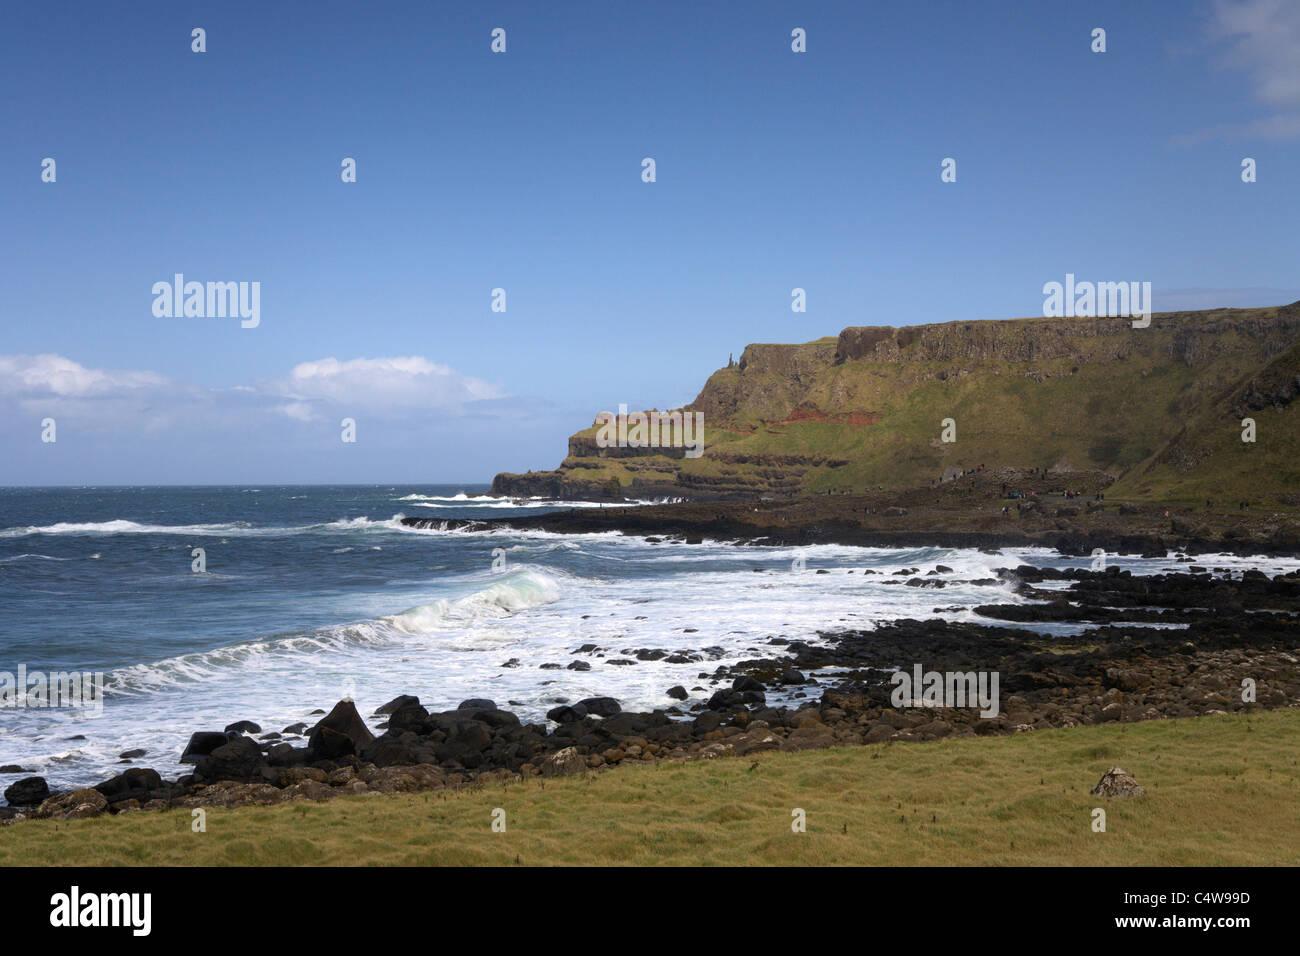 Giants causeway, National Trust, Northern Ireland, County Antrim, seascape - Stock Image